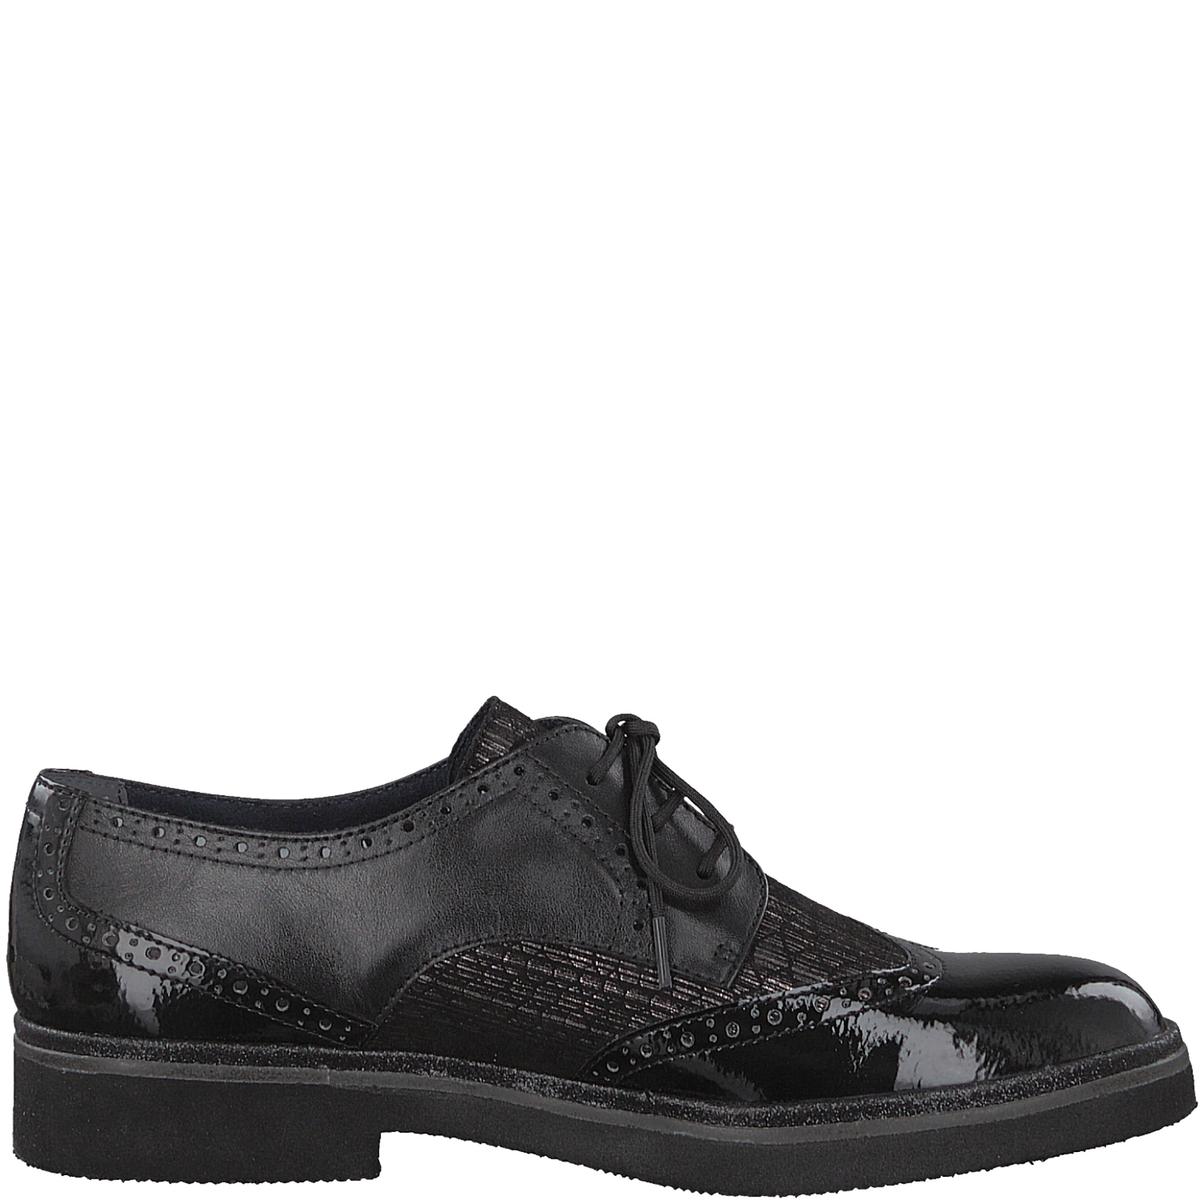 Ботинки-дерби из кожи